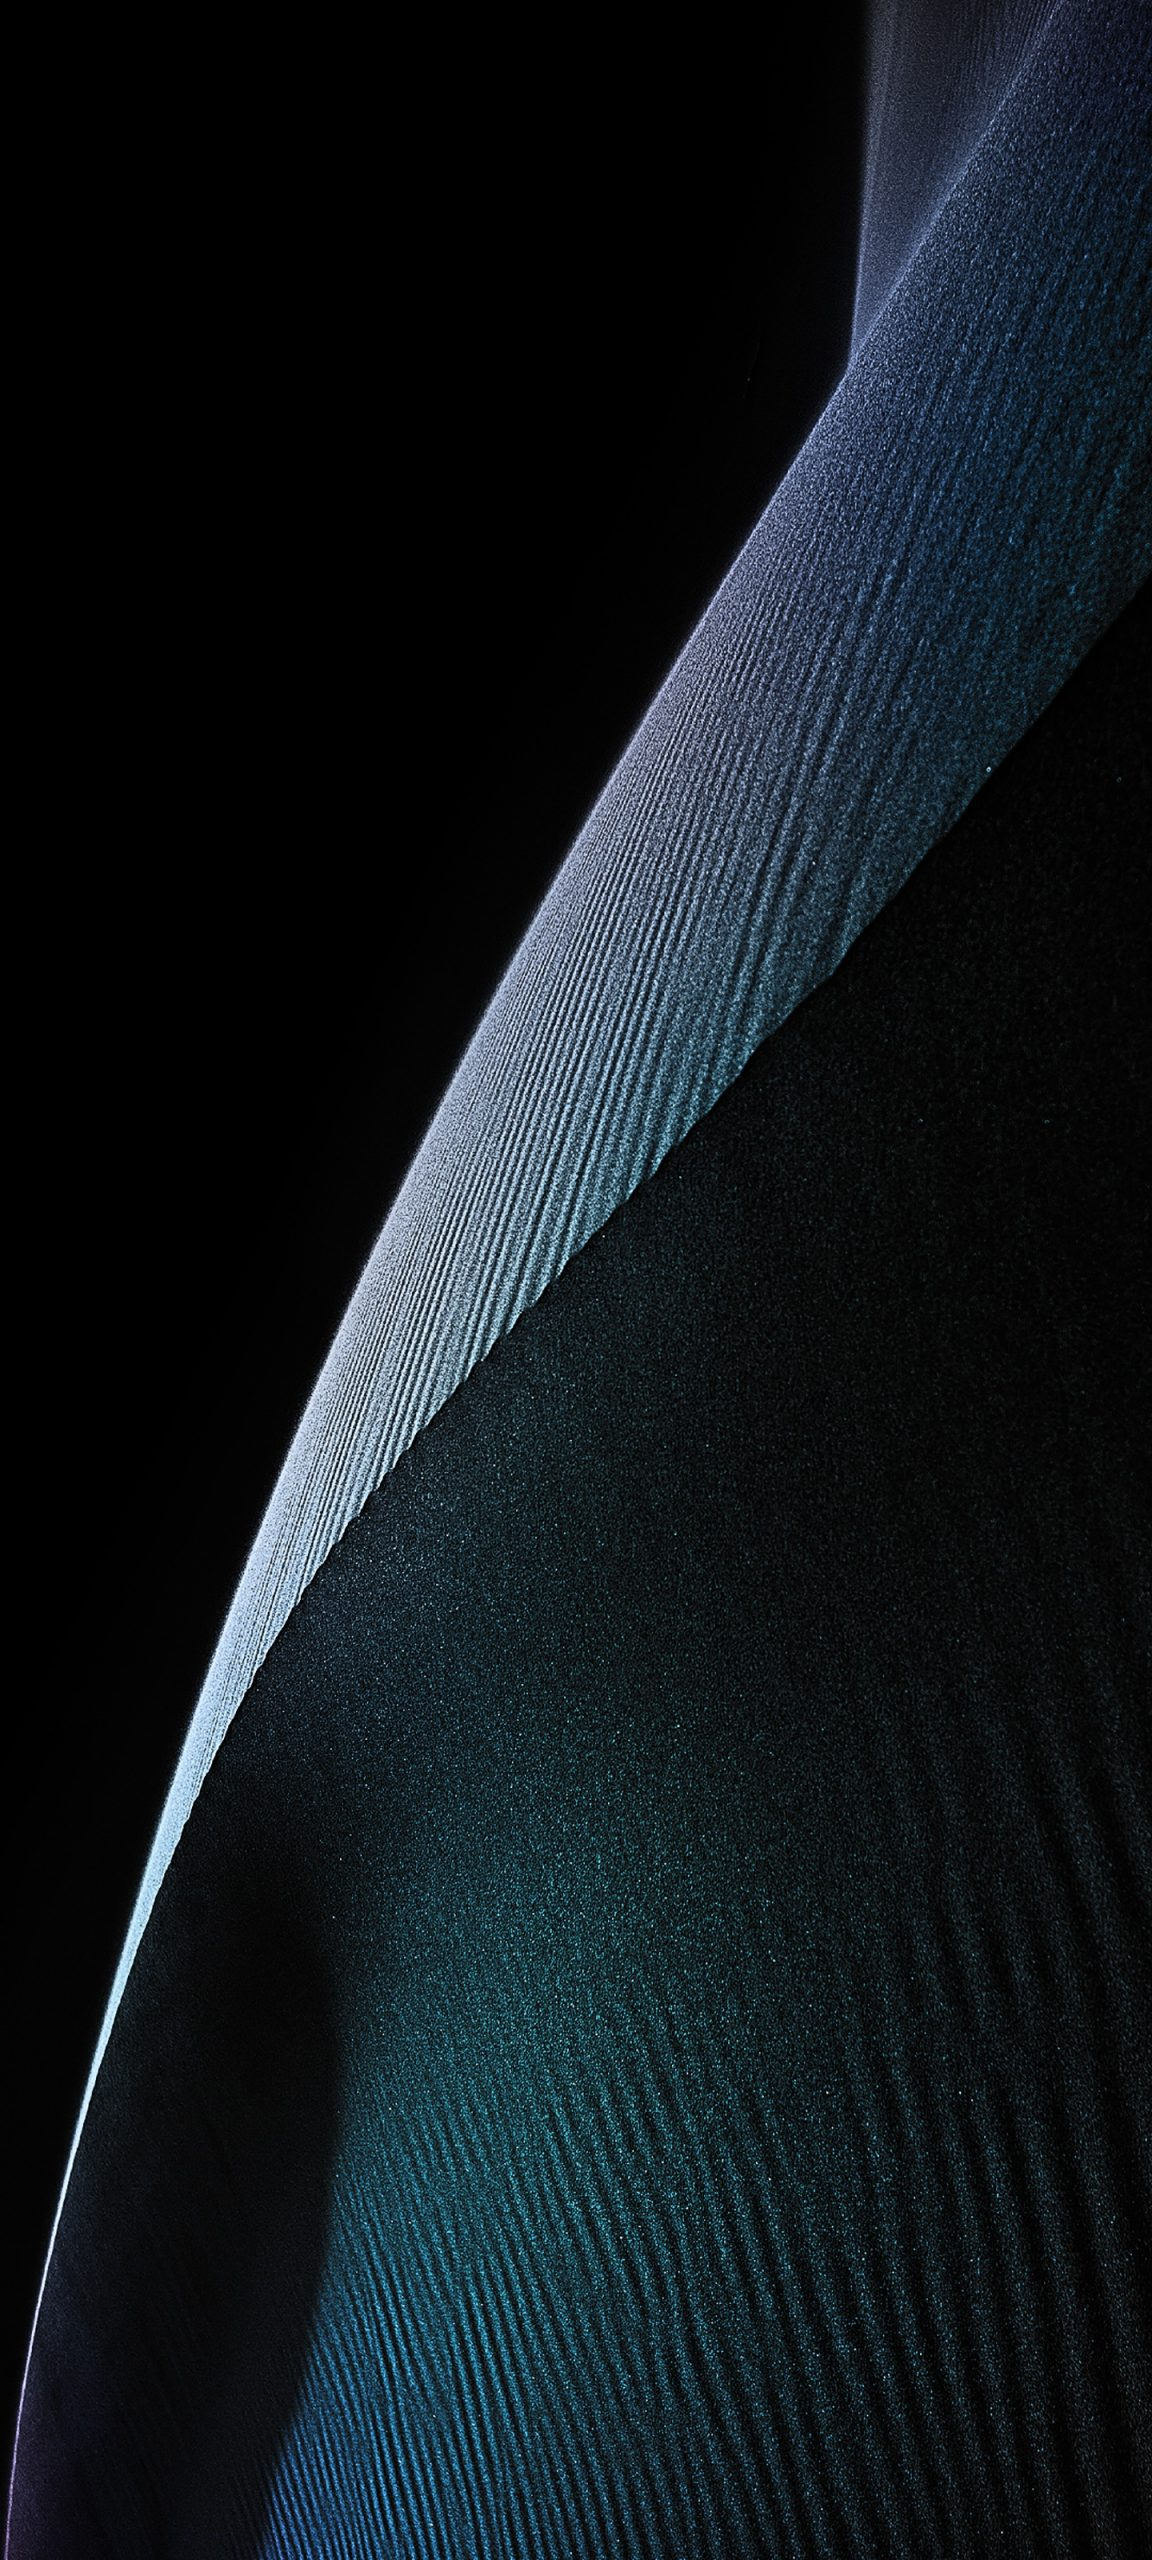 Mi 11 Ultra Stock Wallpapers